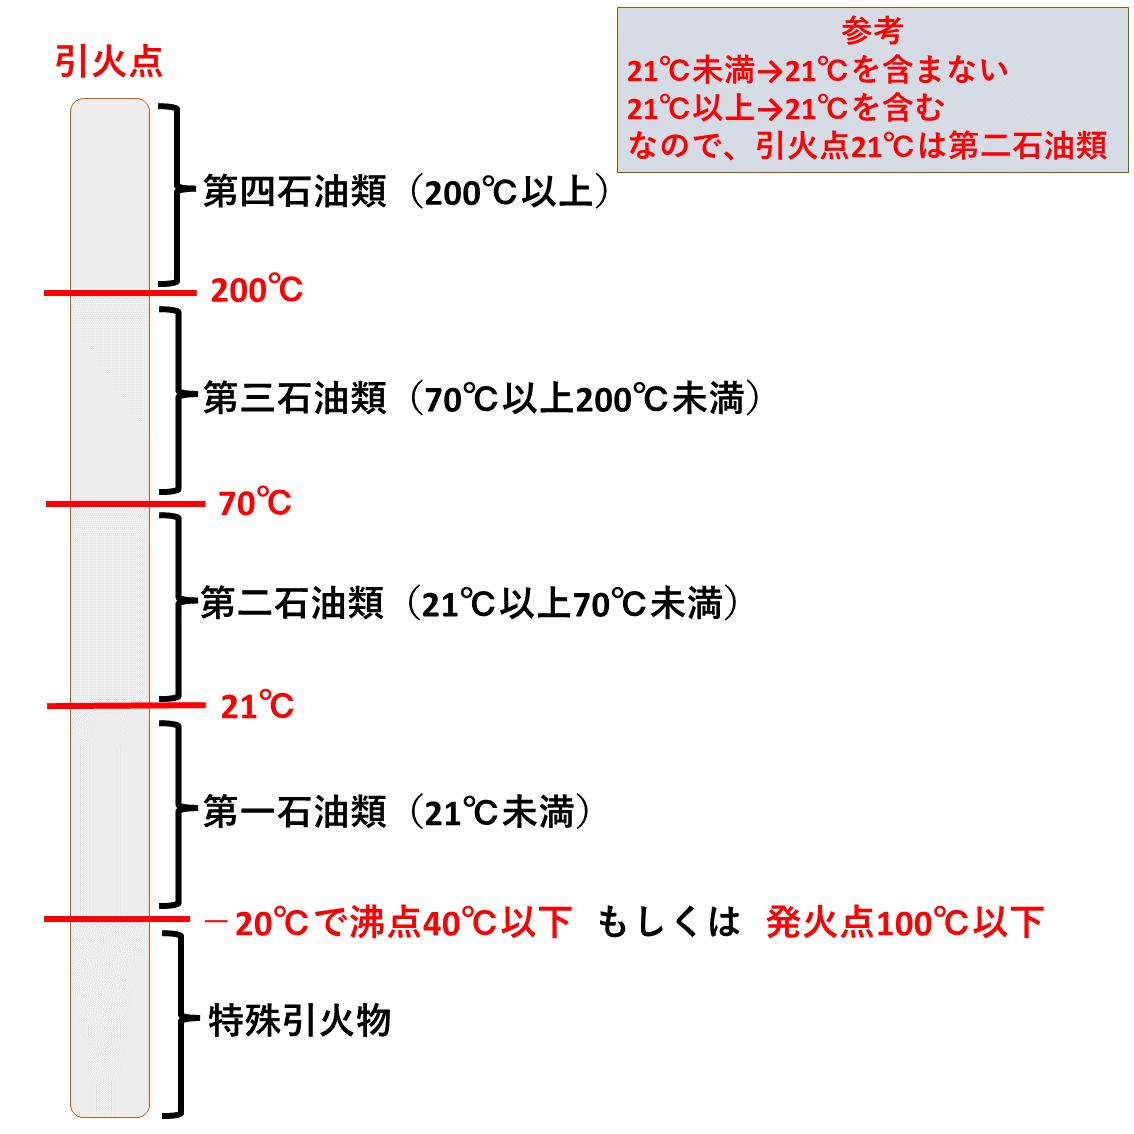 f:id:Think_diary:20210930144704p:plain